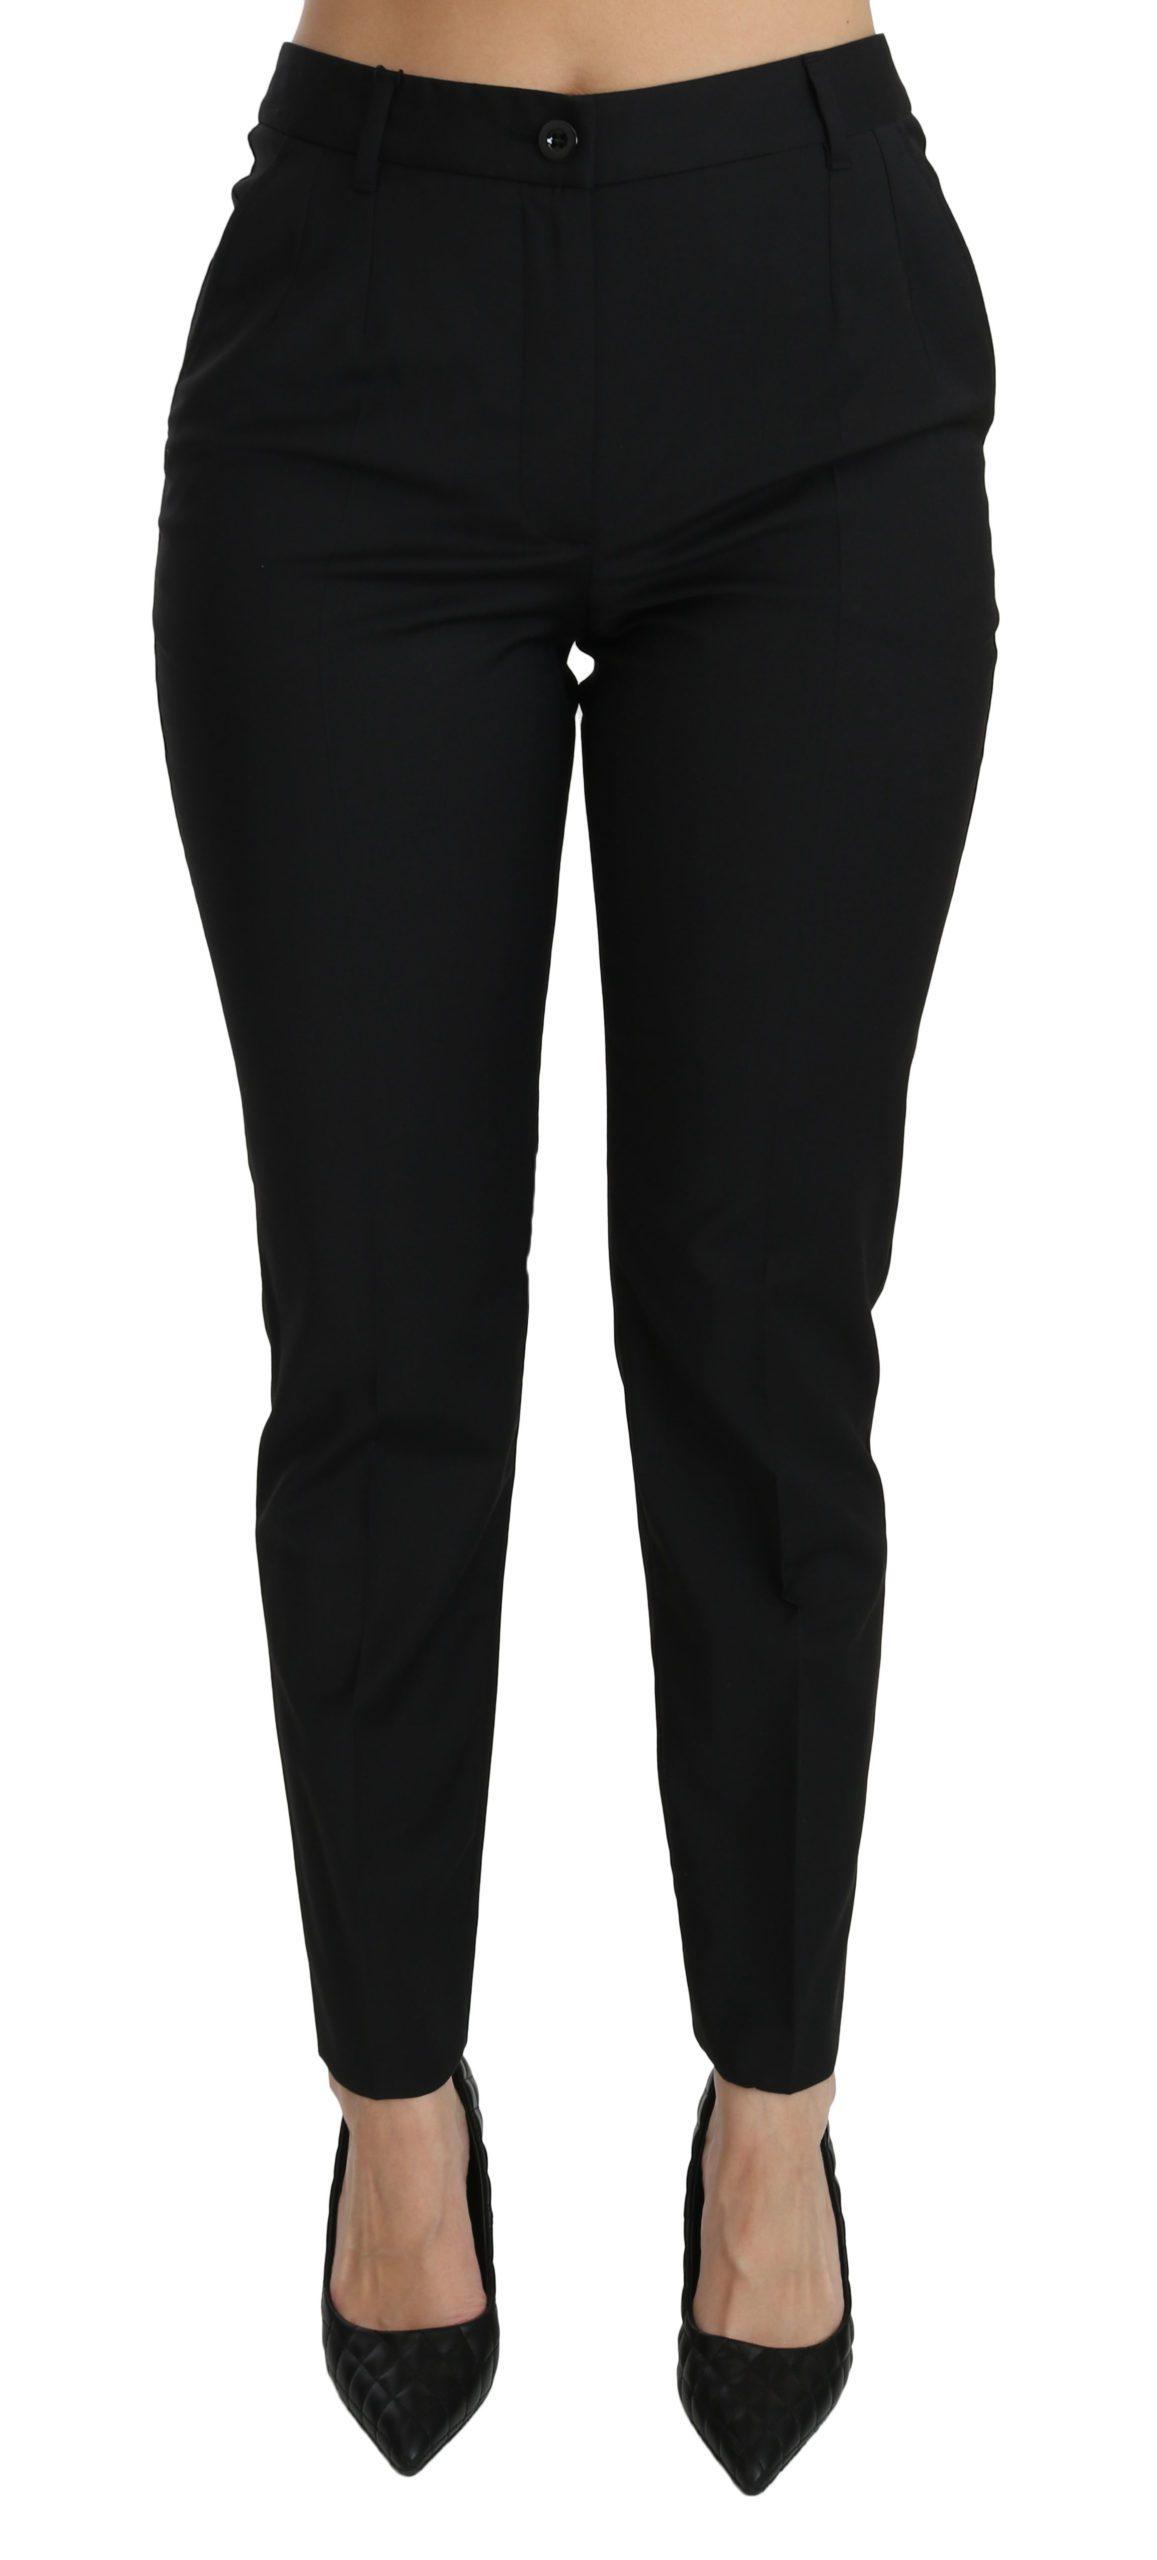 Dolce & Gabbana Women's Mid Waist Skinny Formal Trouser Black PAN70855 - IT42|M